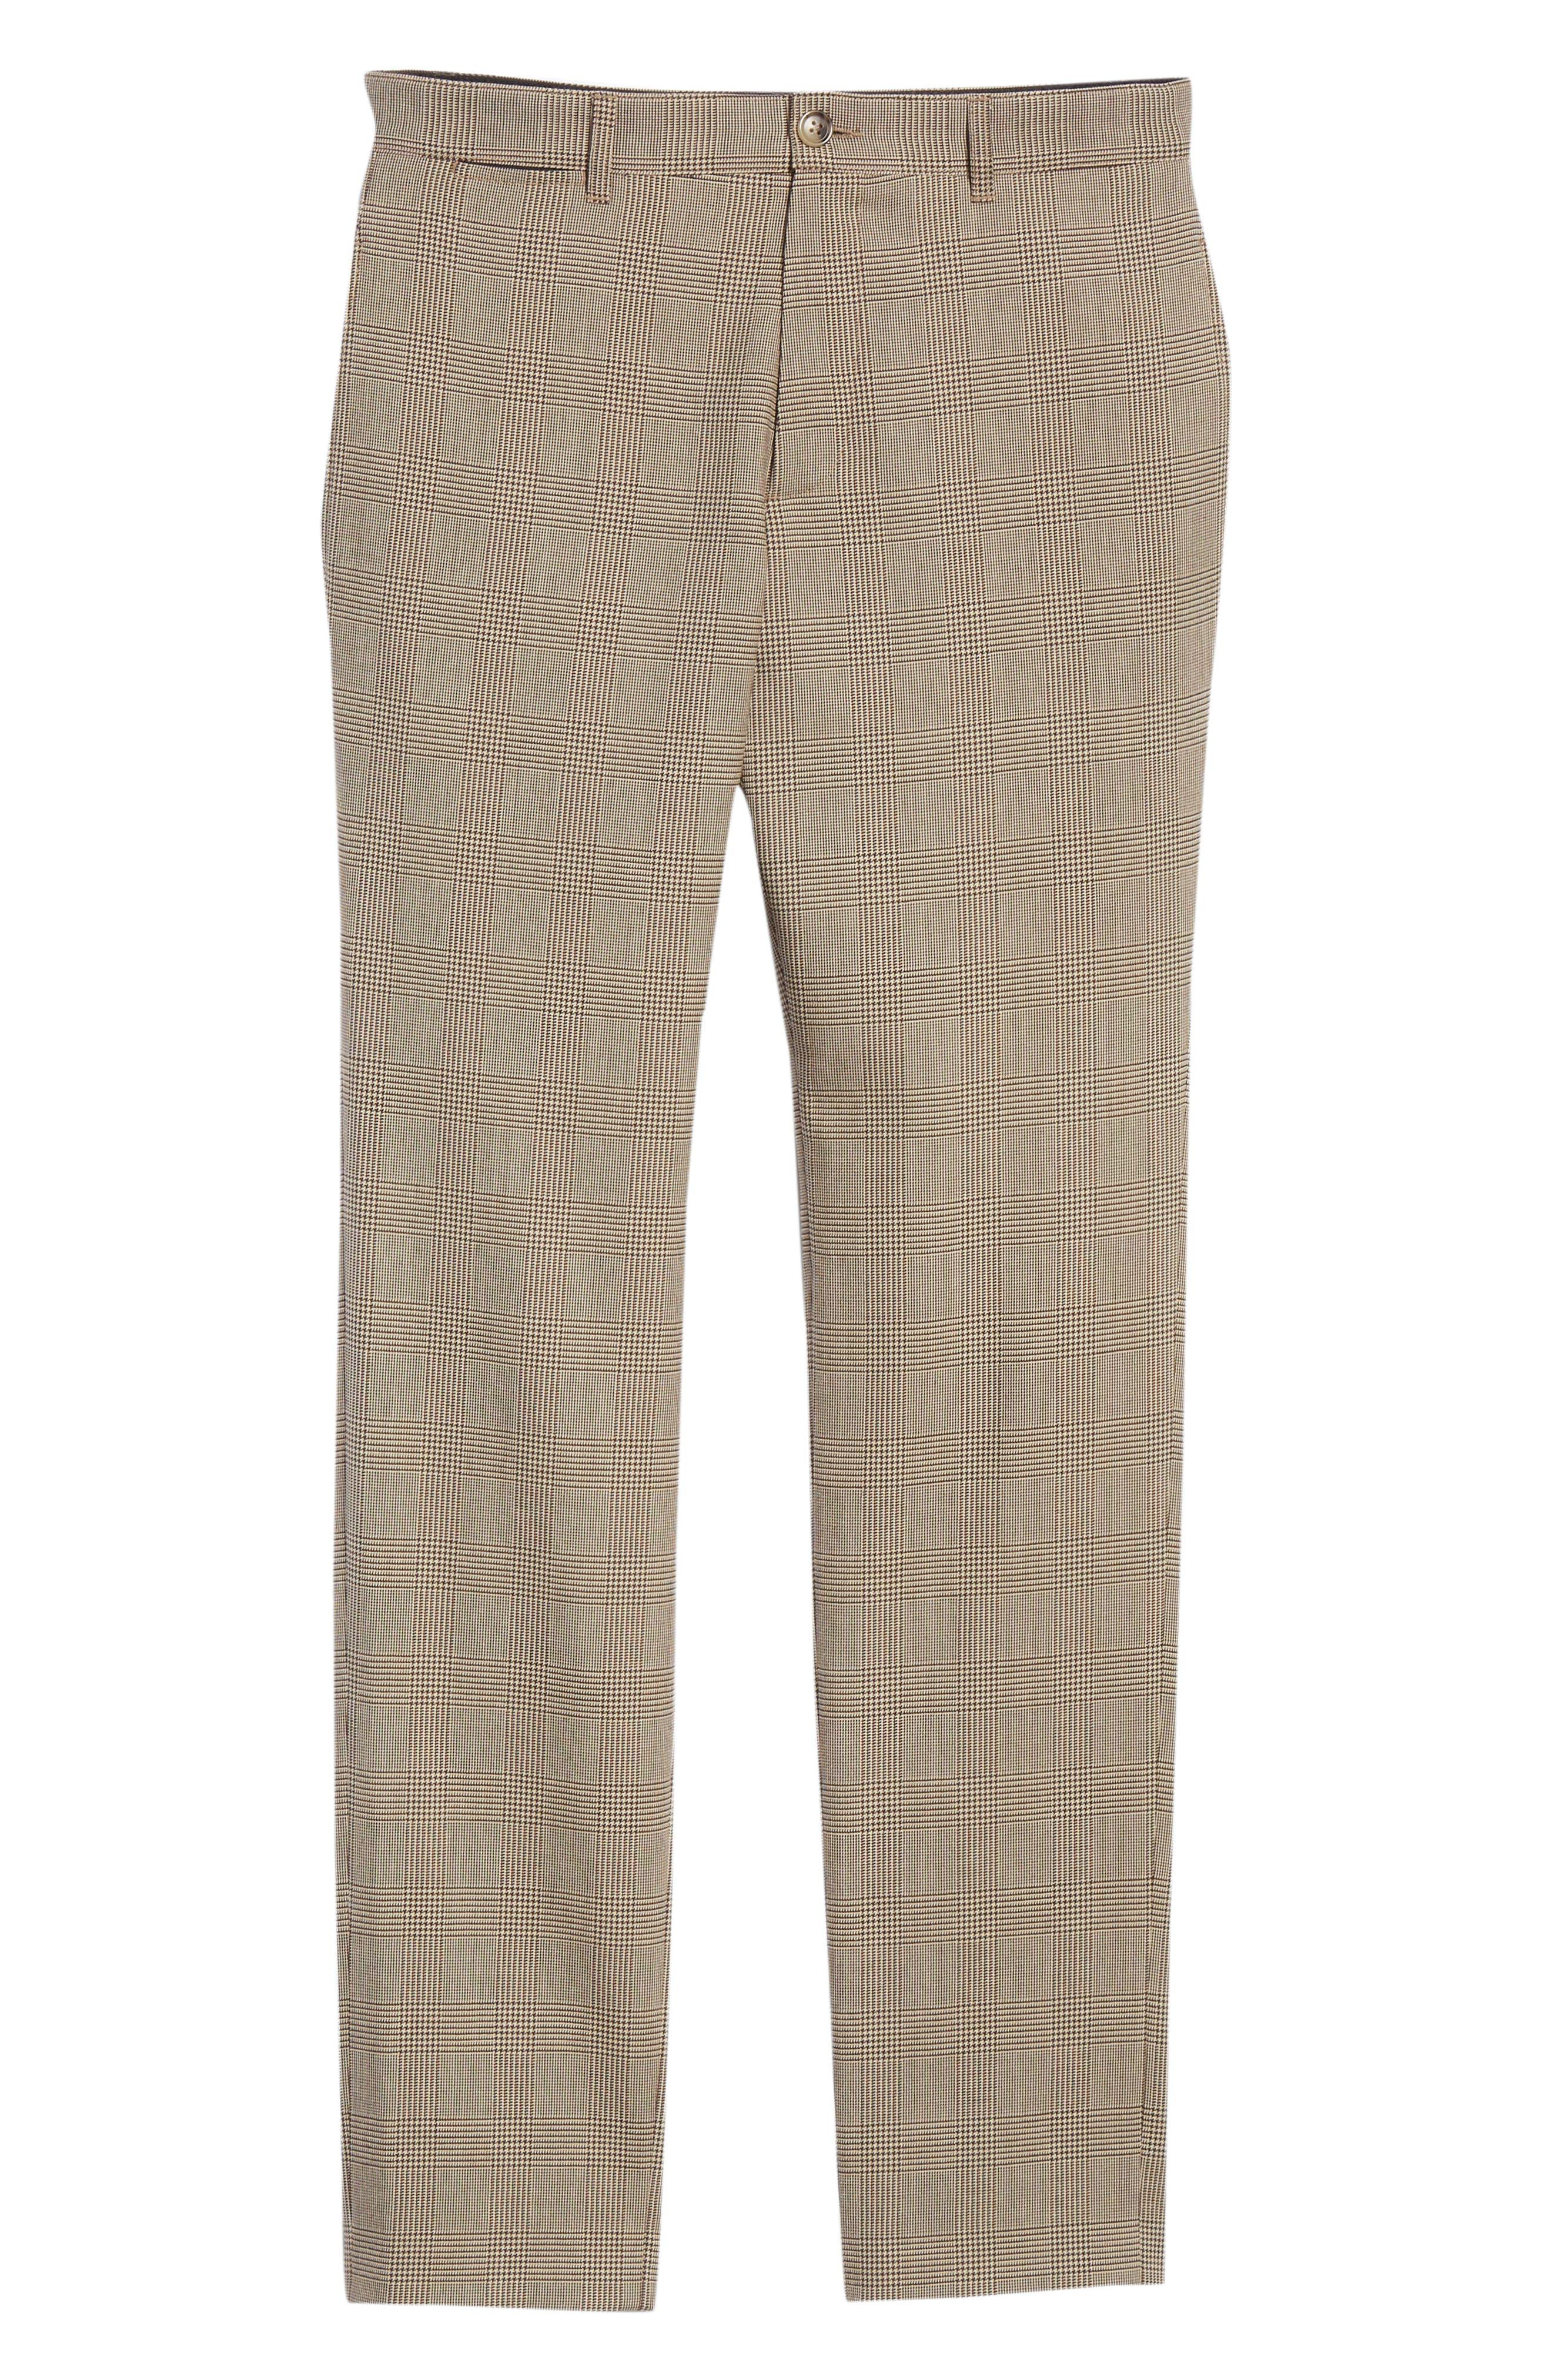 Check Wool Blend Pants,                             Alternate thumbnail 6, color,                             BAC BEIGE